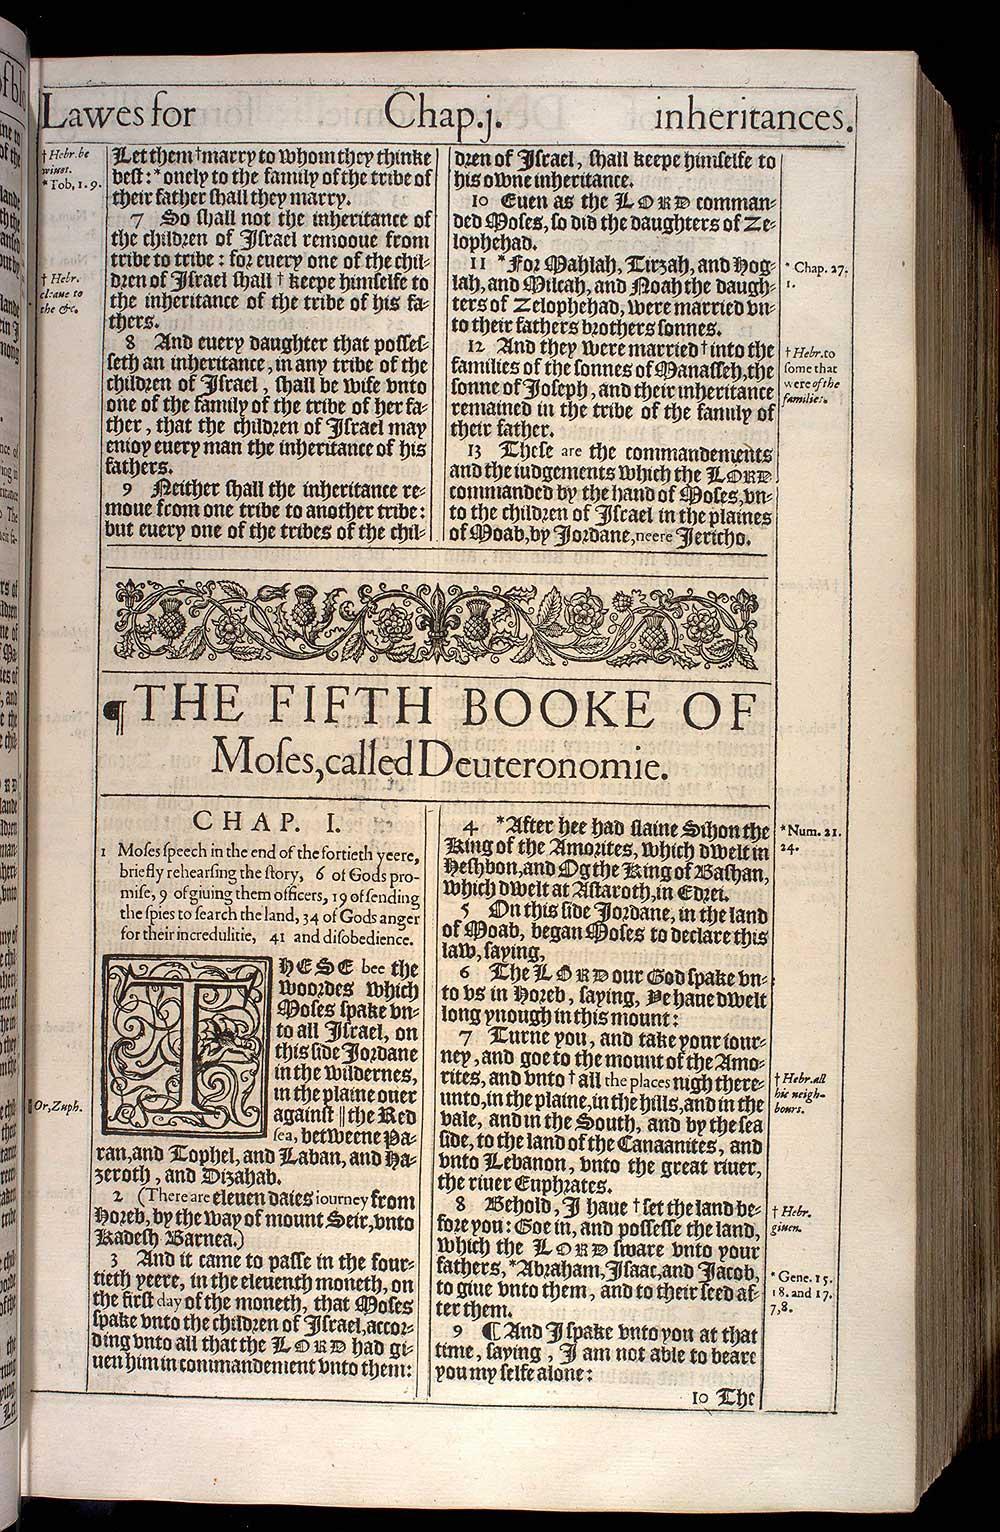 Deuteronomy Chapter 1 Original 1611 Bible Scan